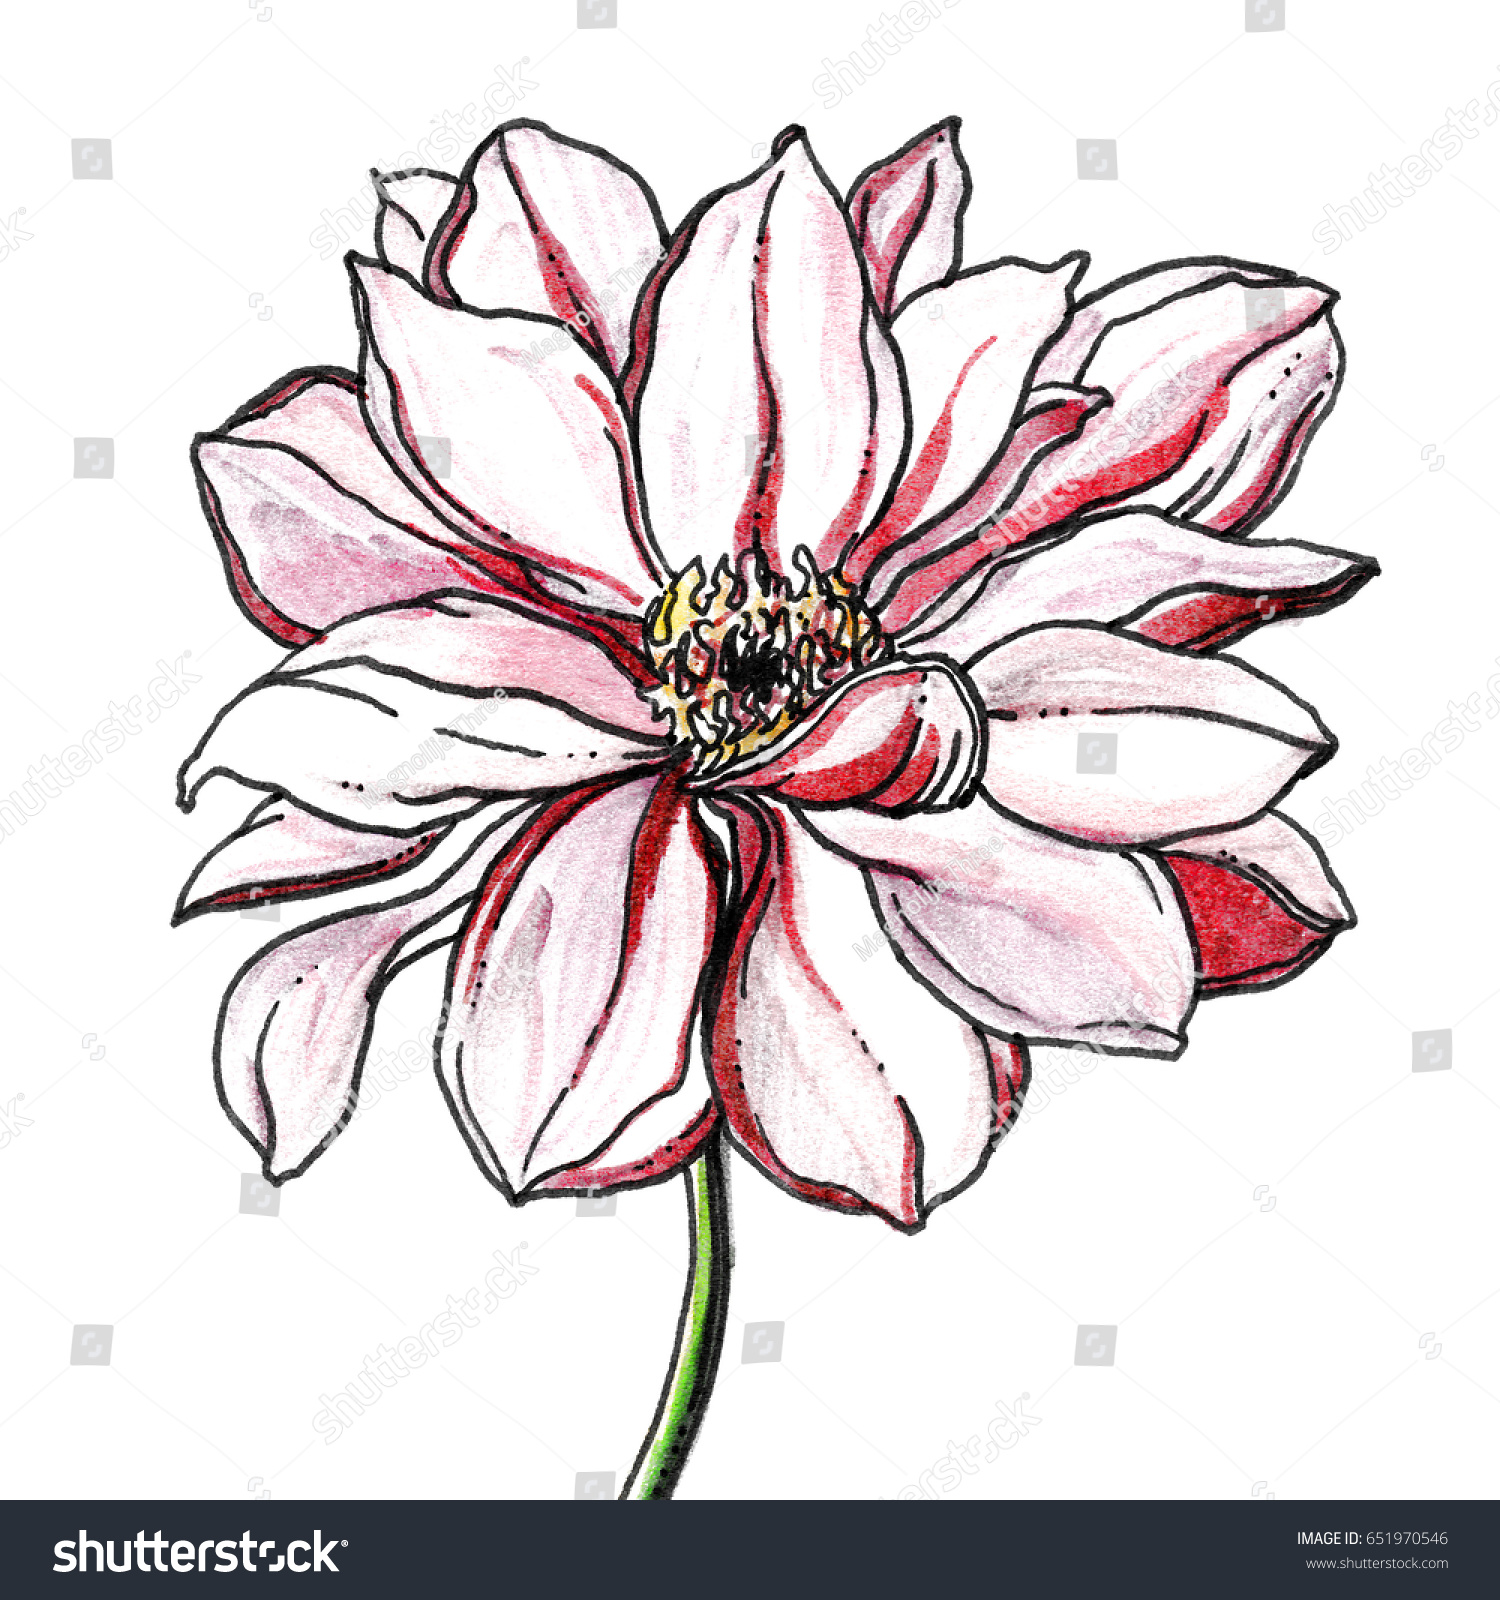 Red White Passion Hawaiian Dahlia Flower Stock Illustration